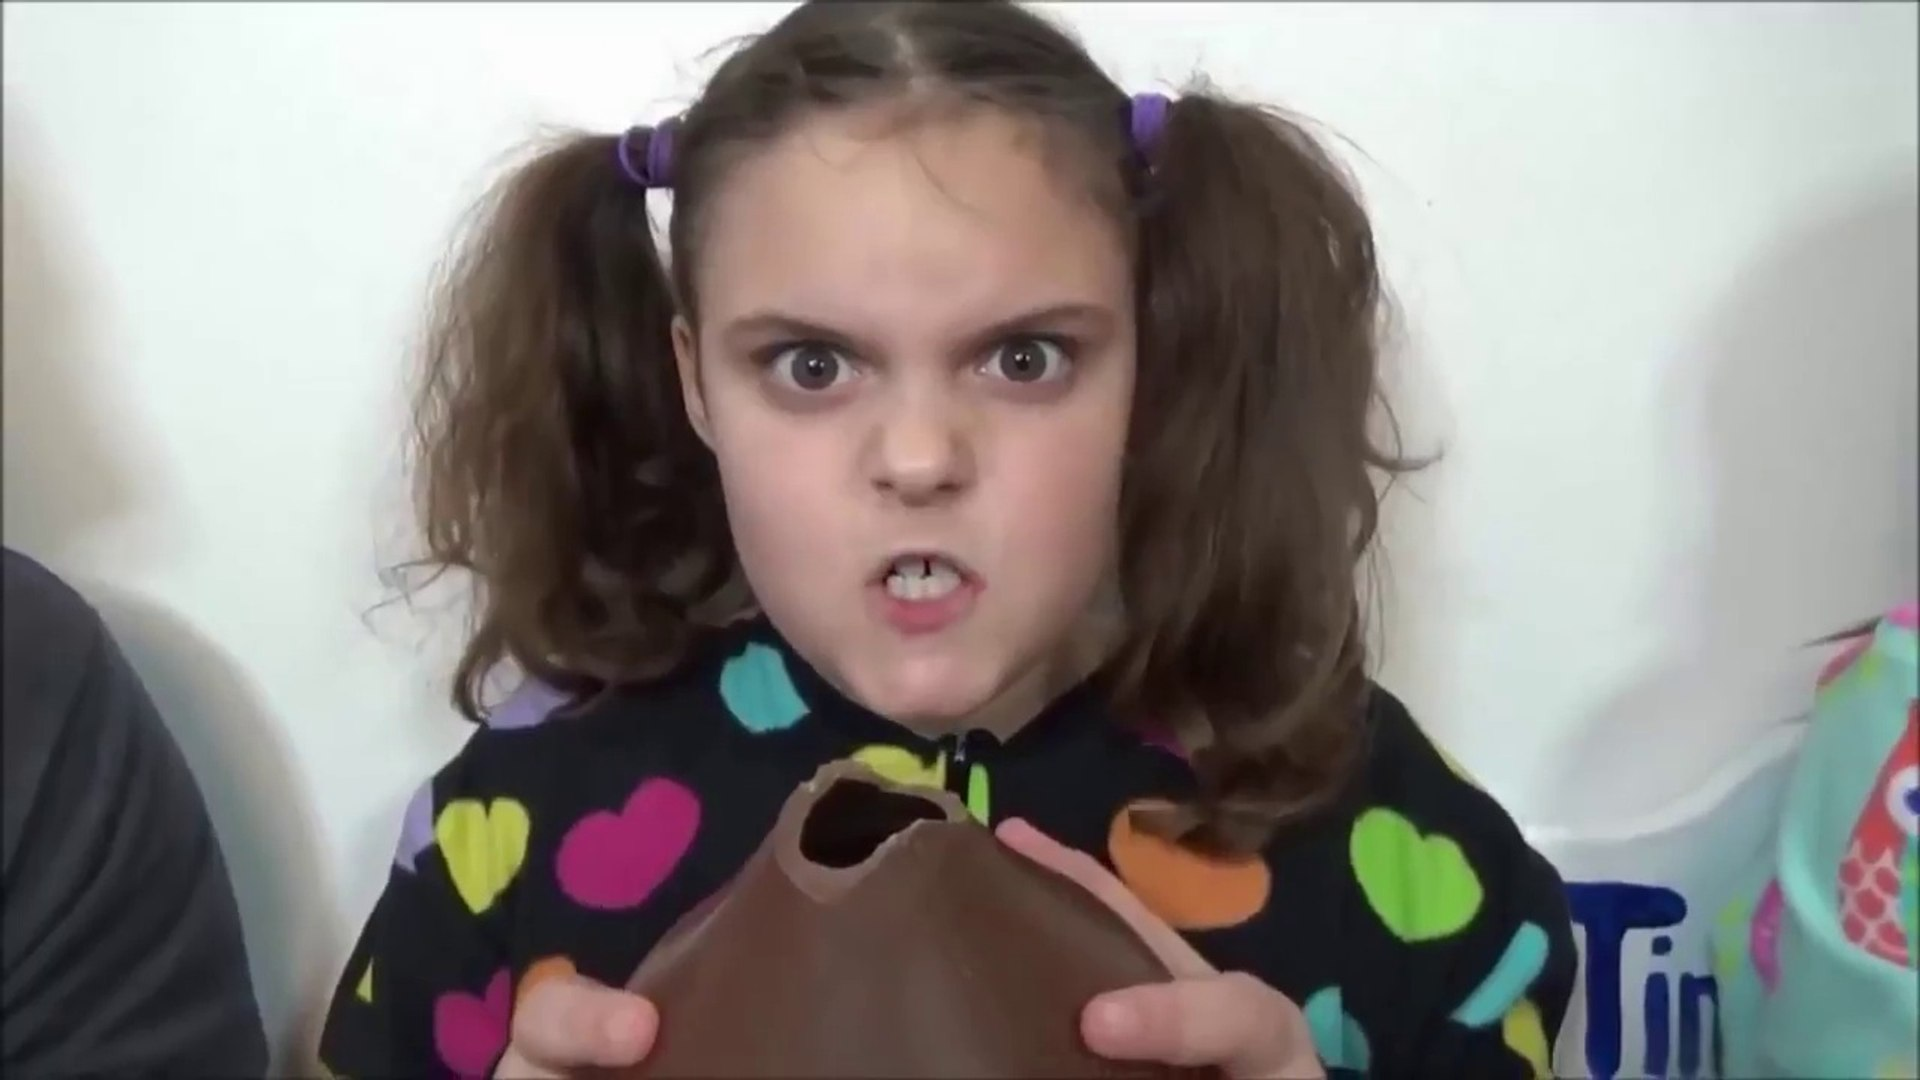 Toy Freaks - Freak Family Vlogs - Bad Baby Giant Candy Taste Test Challenge Toy Freaks Family Bad ki